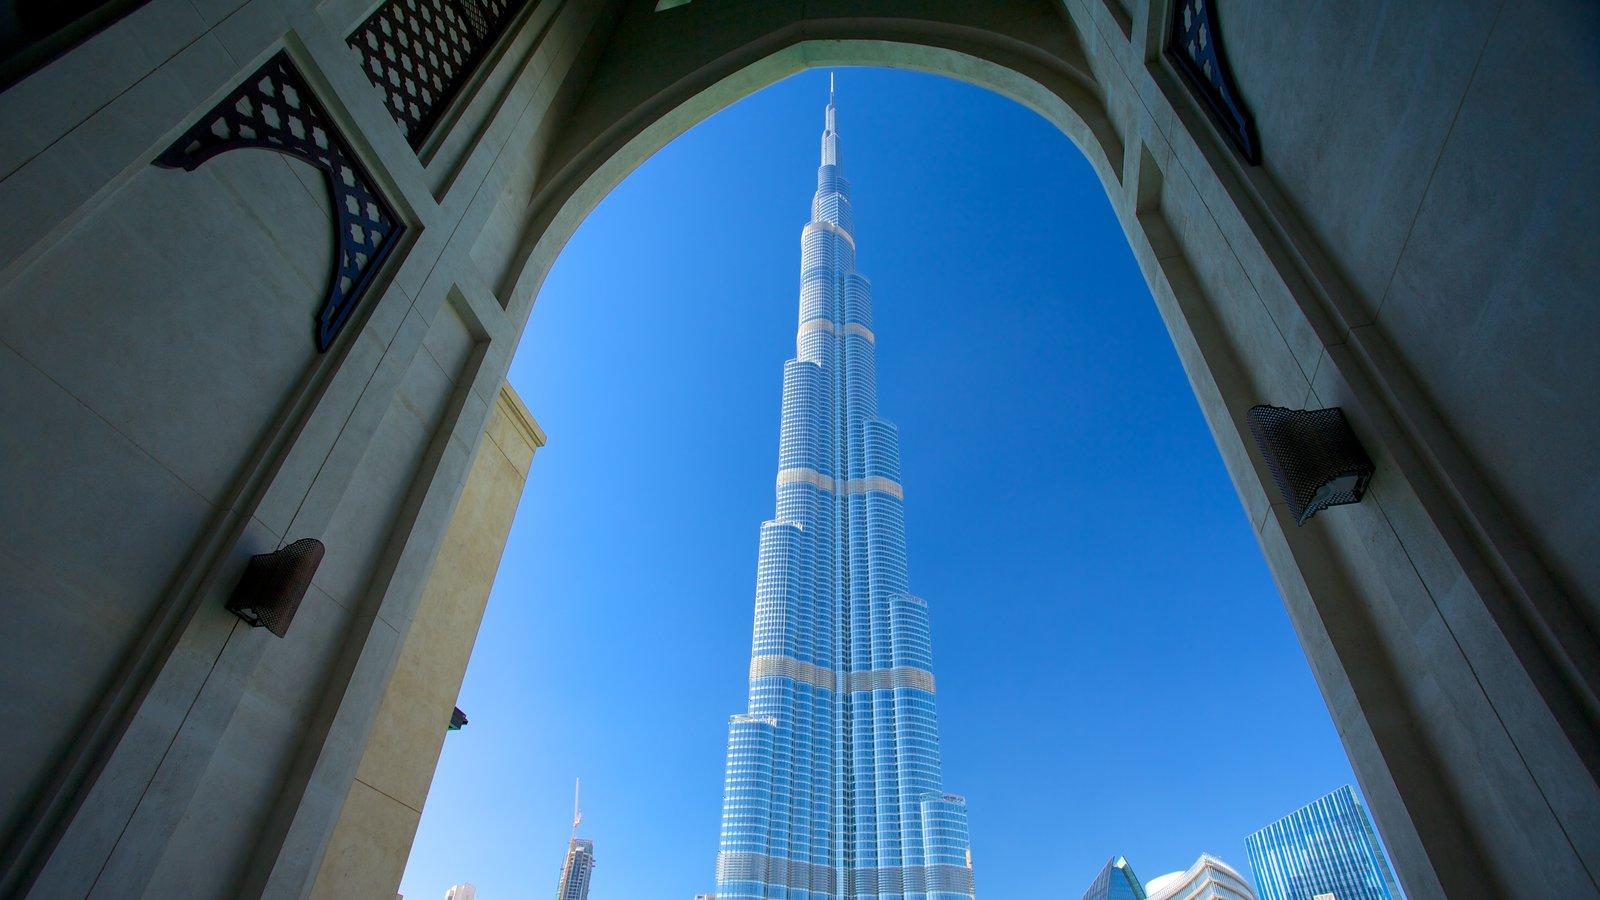 Burj Khalifa mostrando arquitectura moderna y un rascacielos